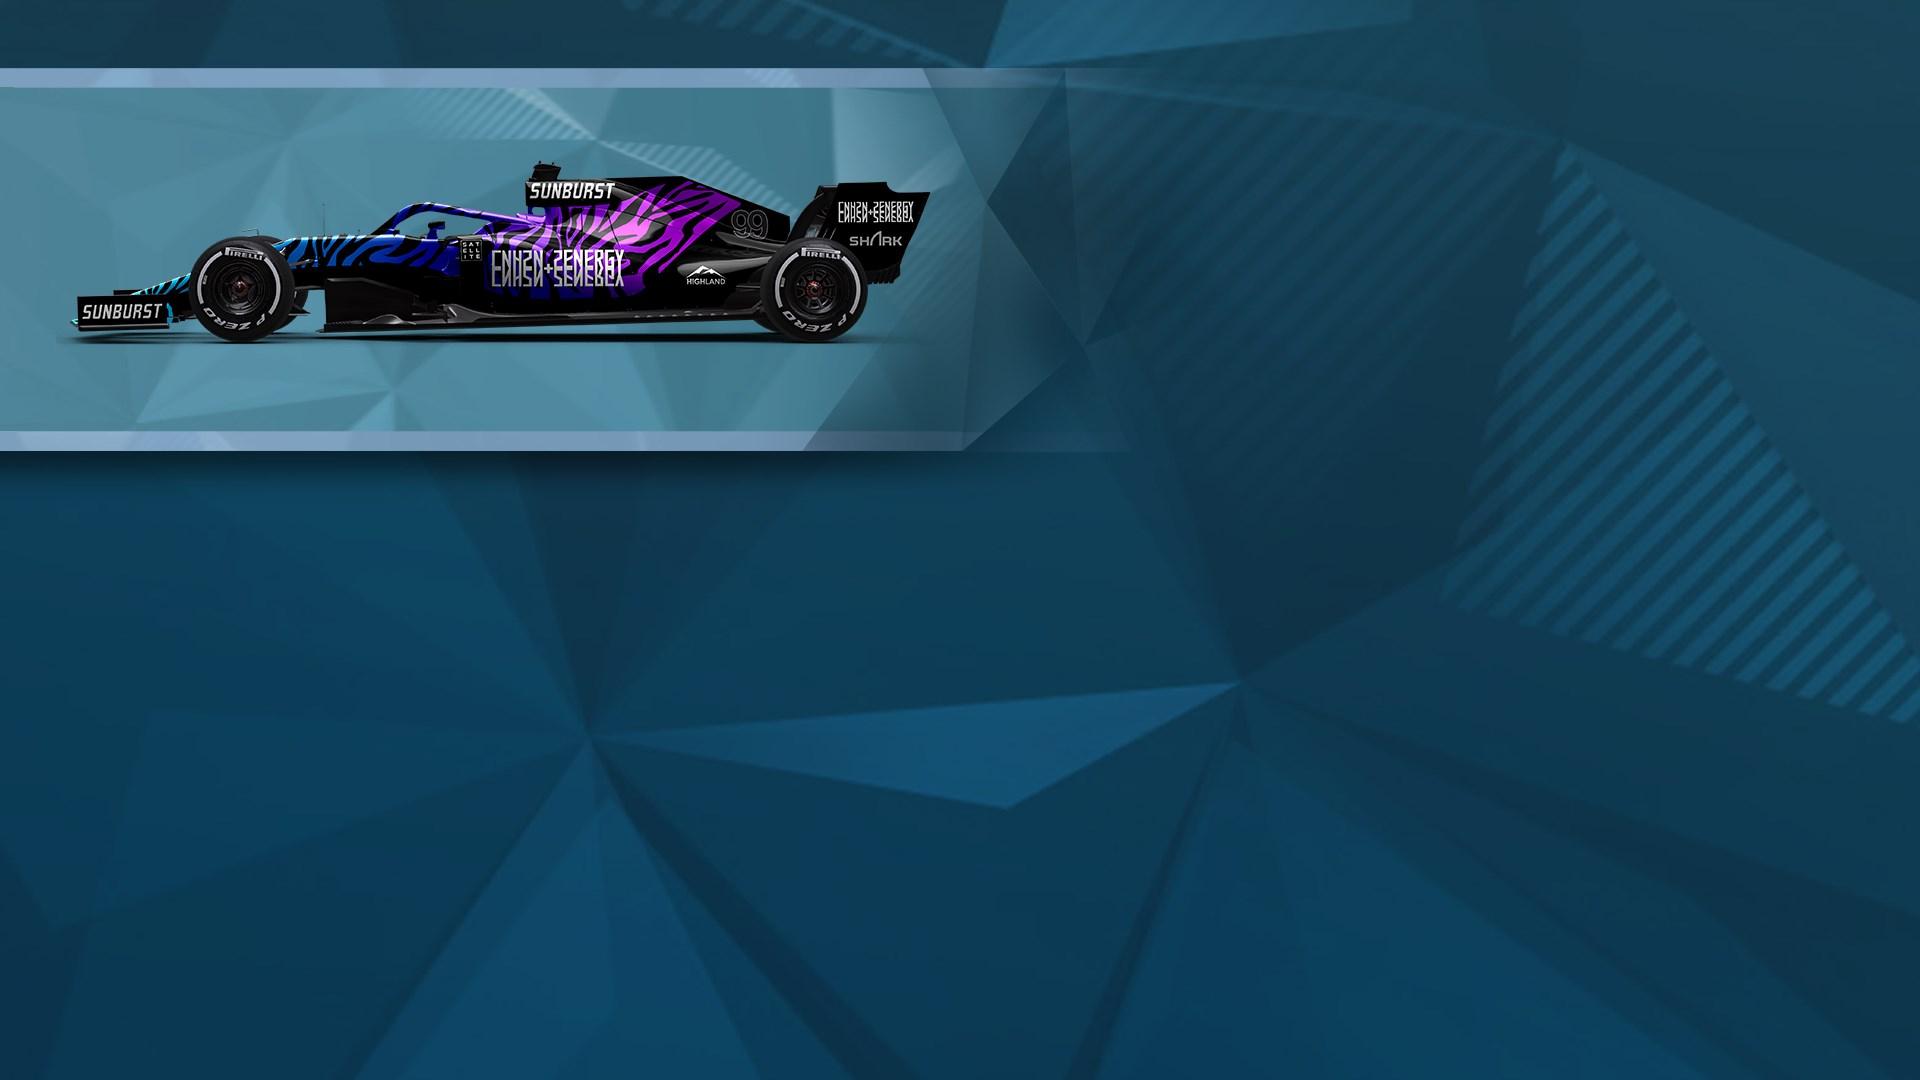 F1® 2019: Car Livery 'CNH2N+2ENERGY - Tiger'